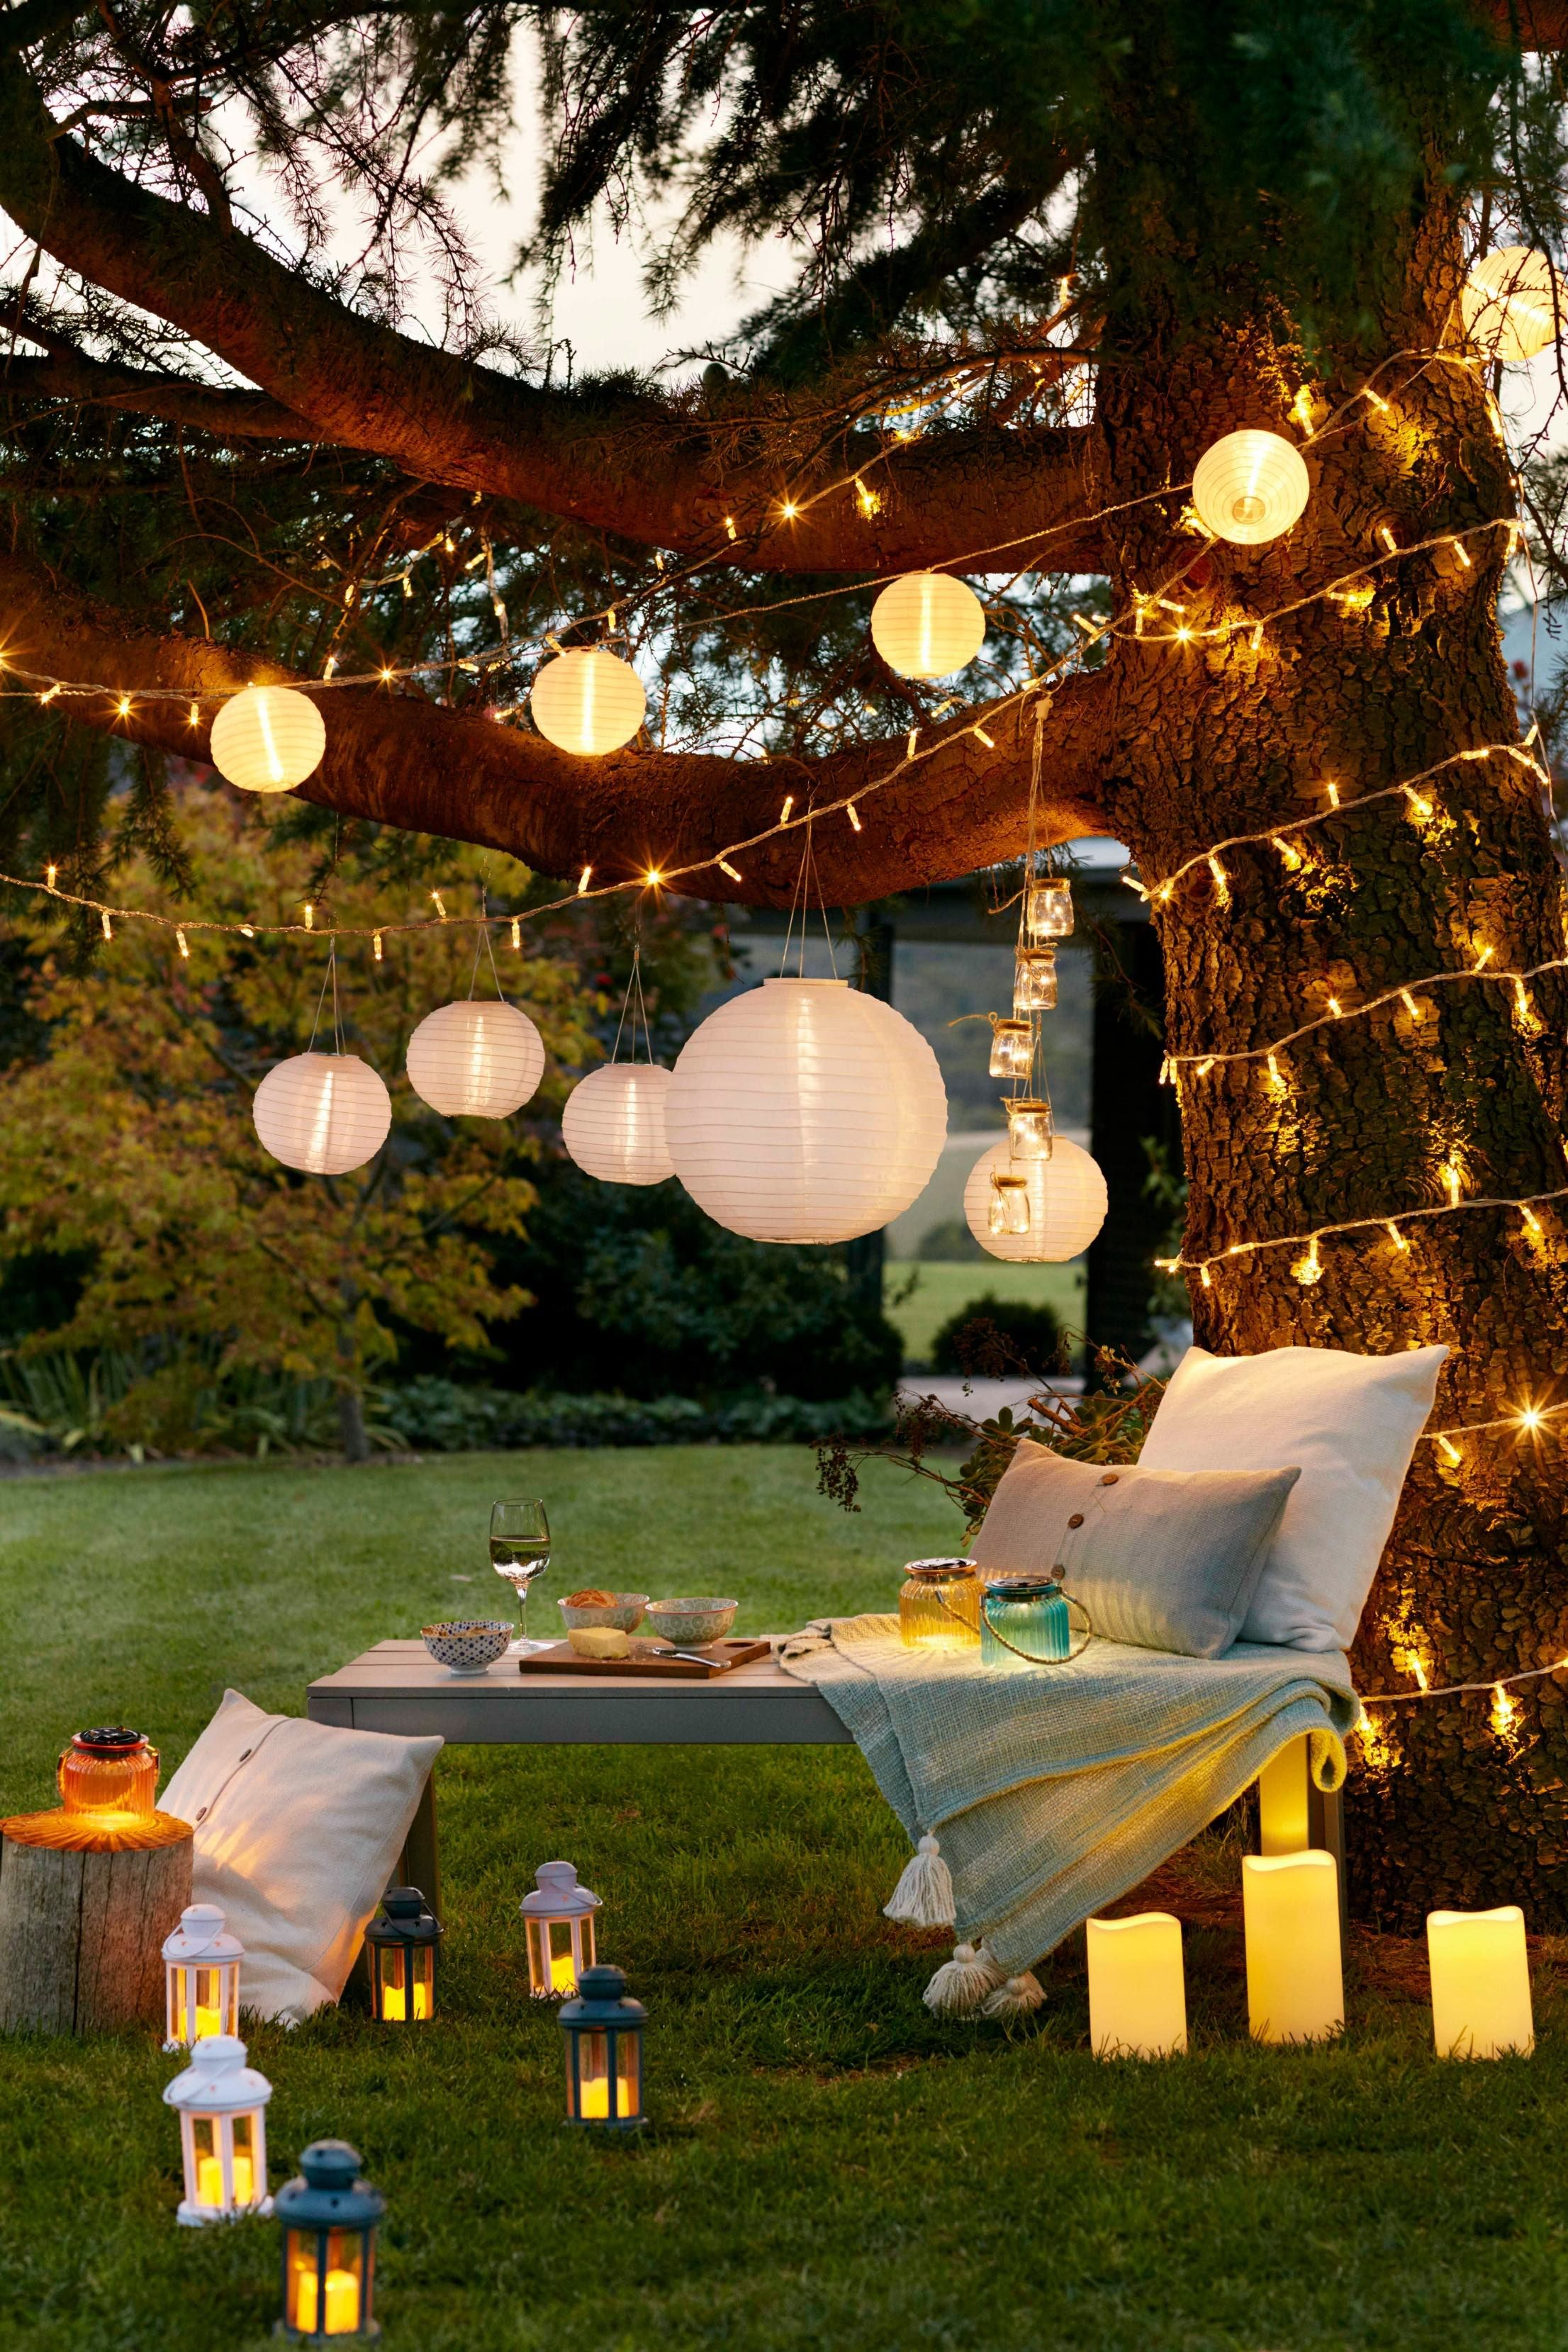 10 Ideas For The Perfect Summer Party Outdoor Garden Lighting Diy Outdoor Lighting Solar Lights Garden